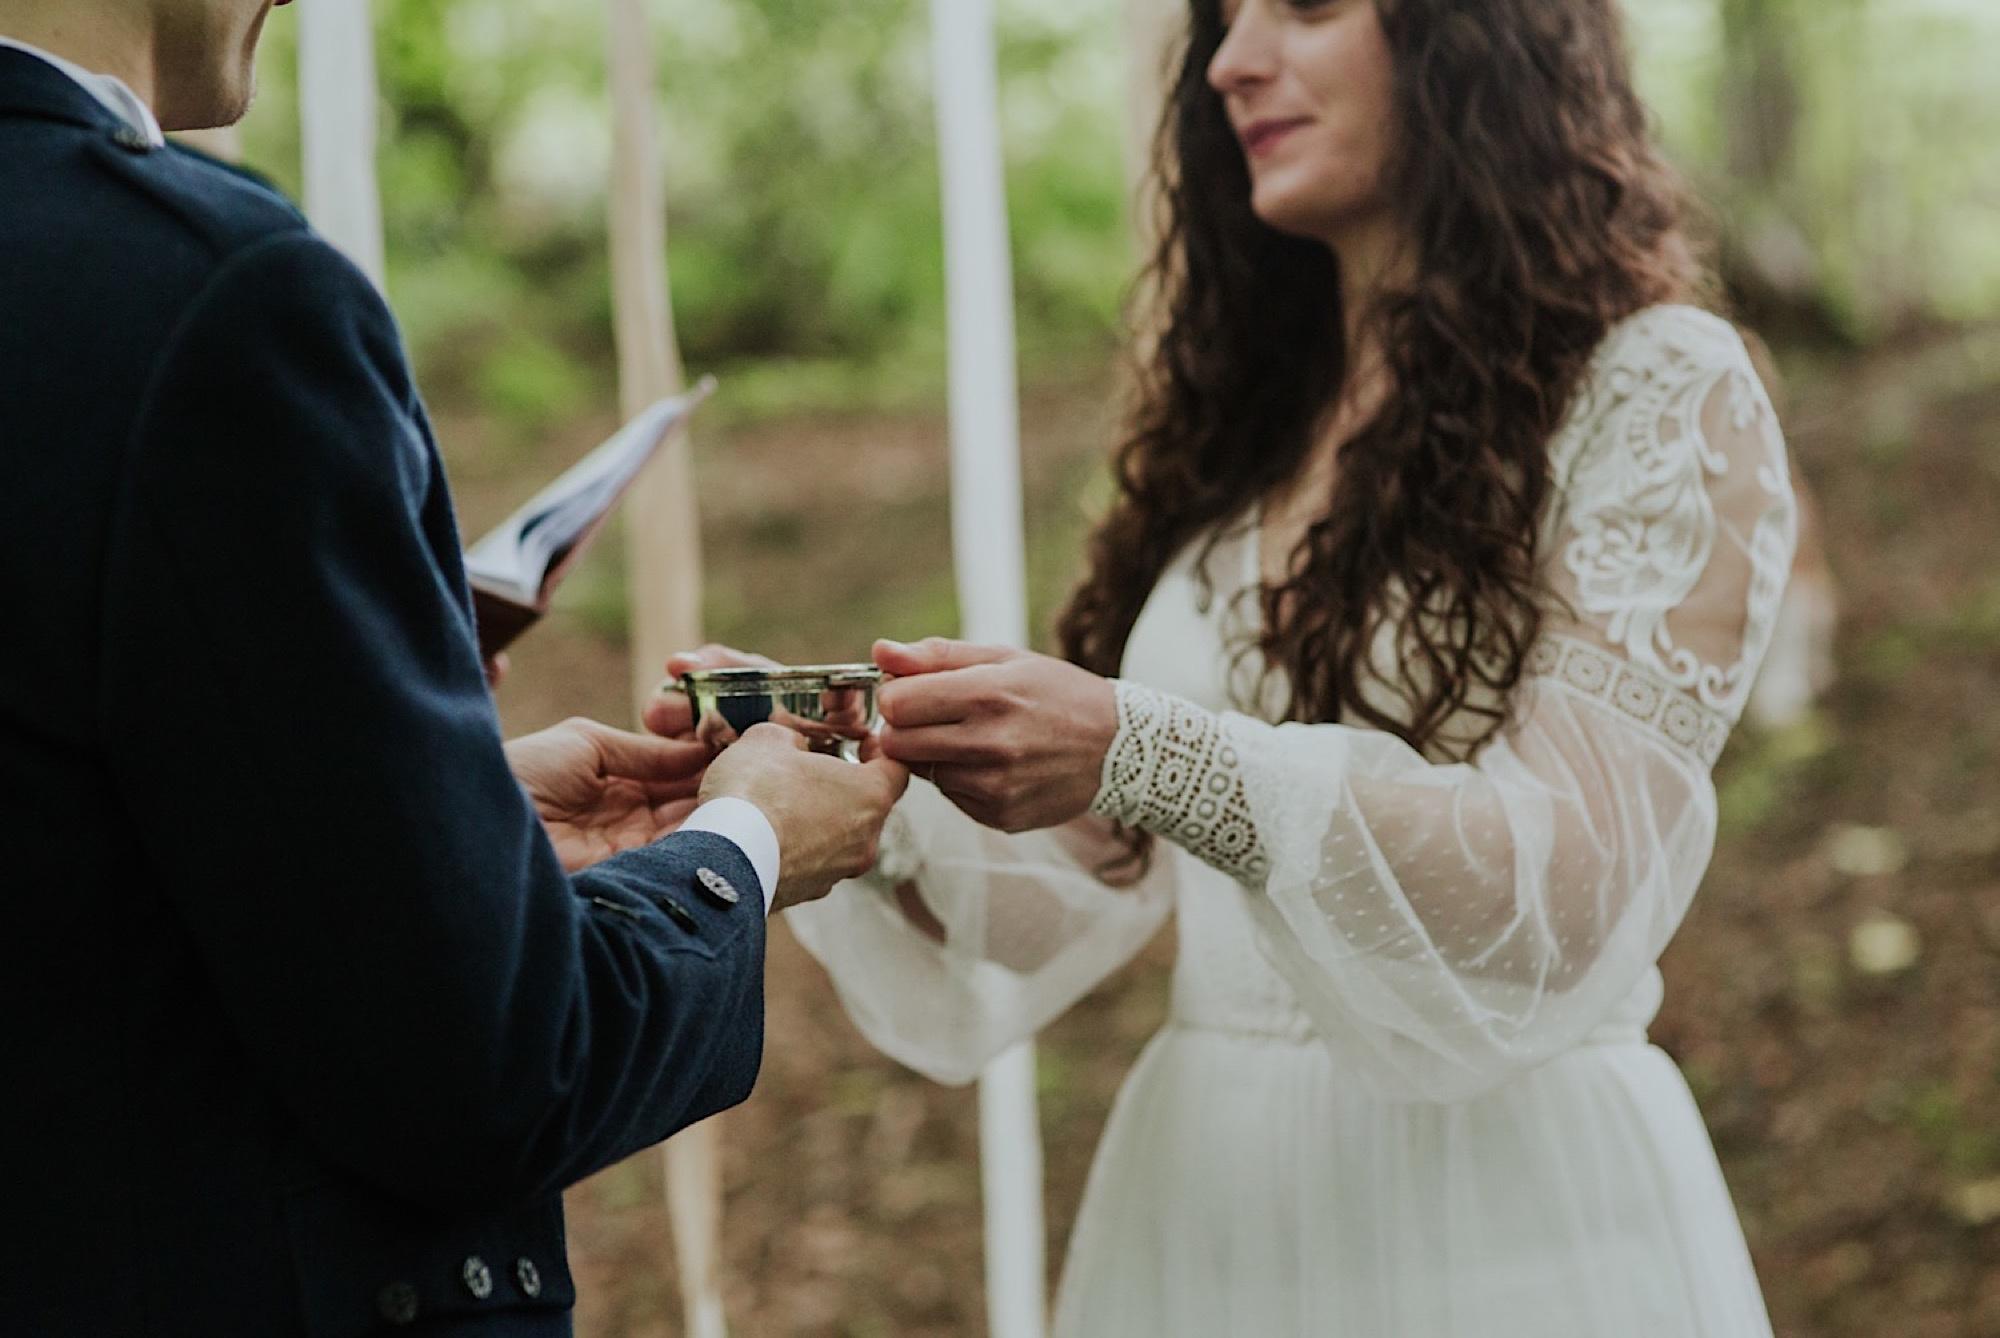 quaich ceremony scottish wedding